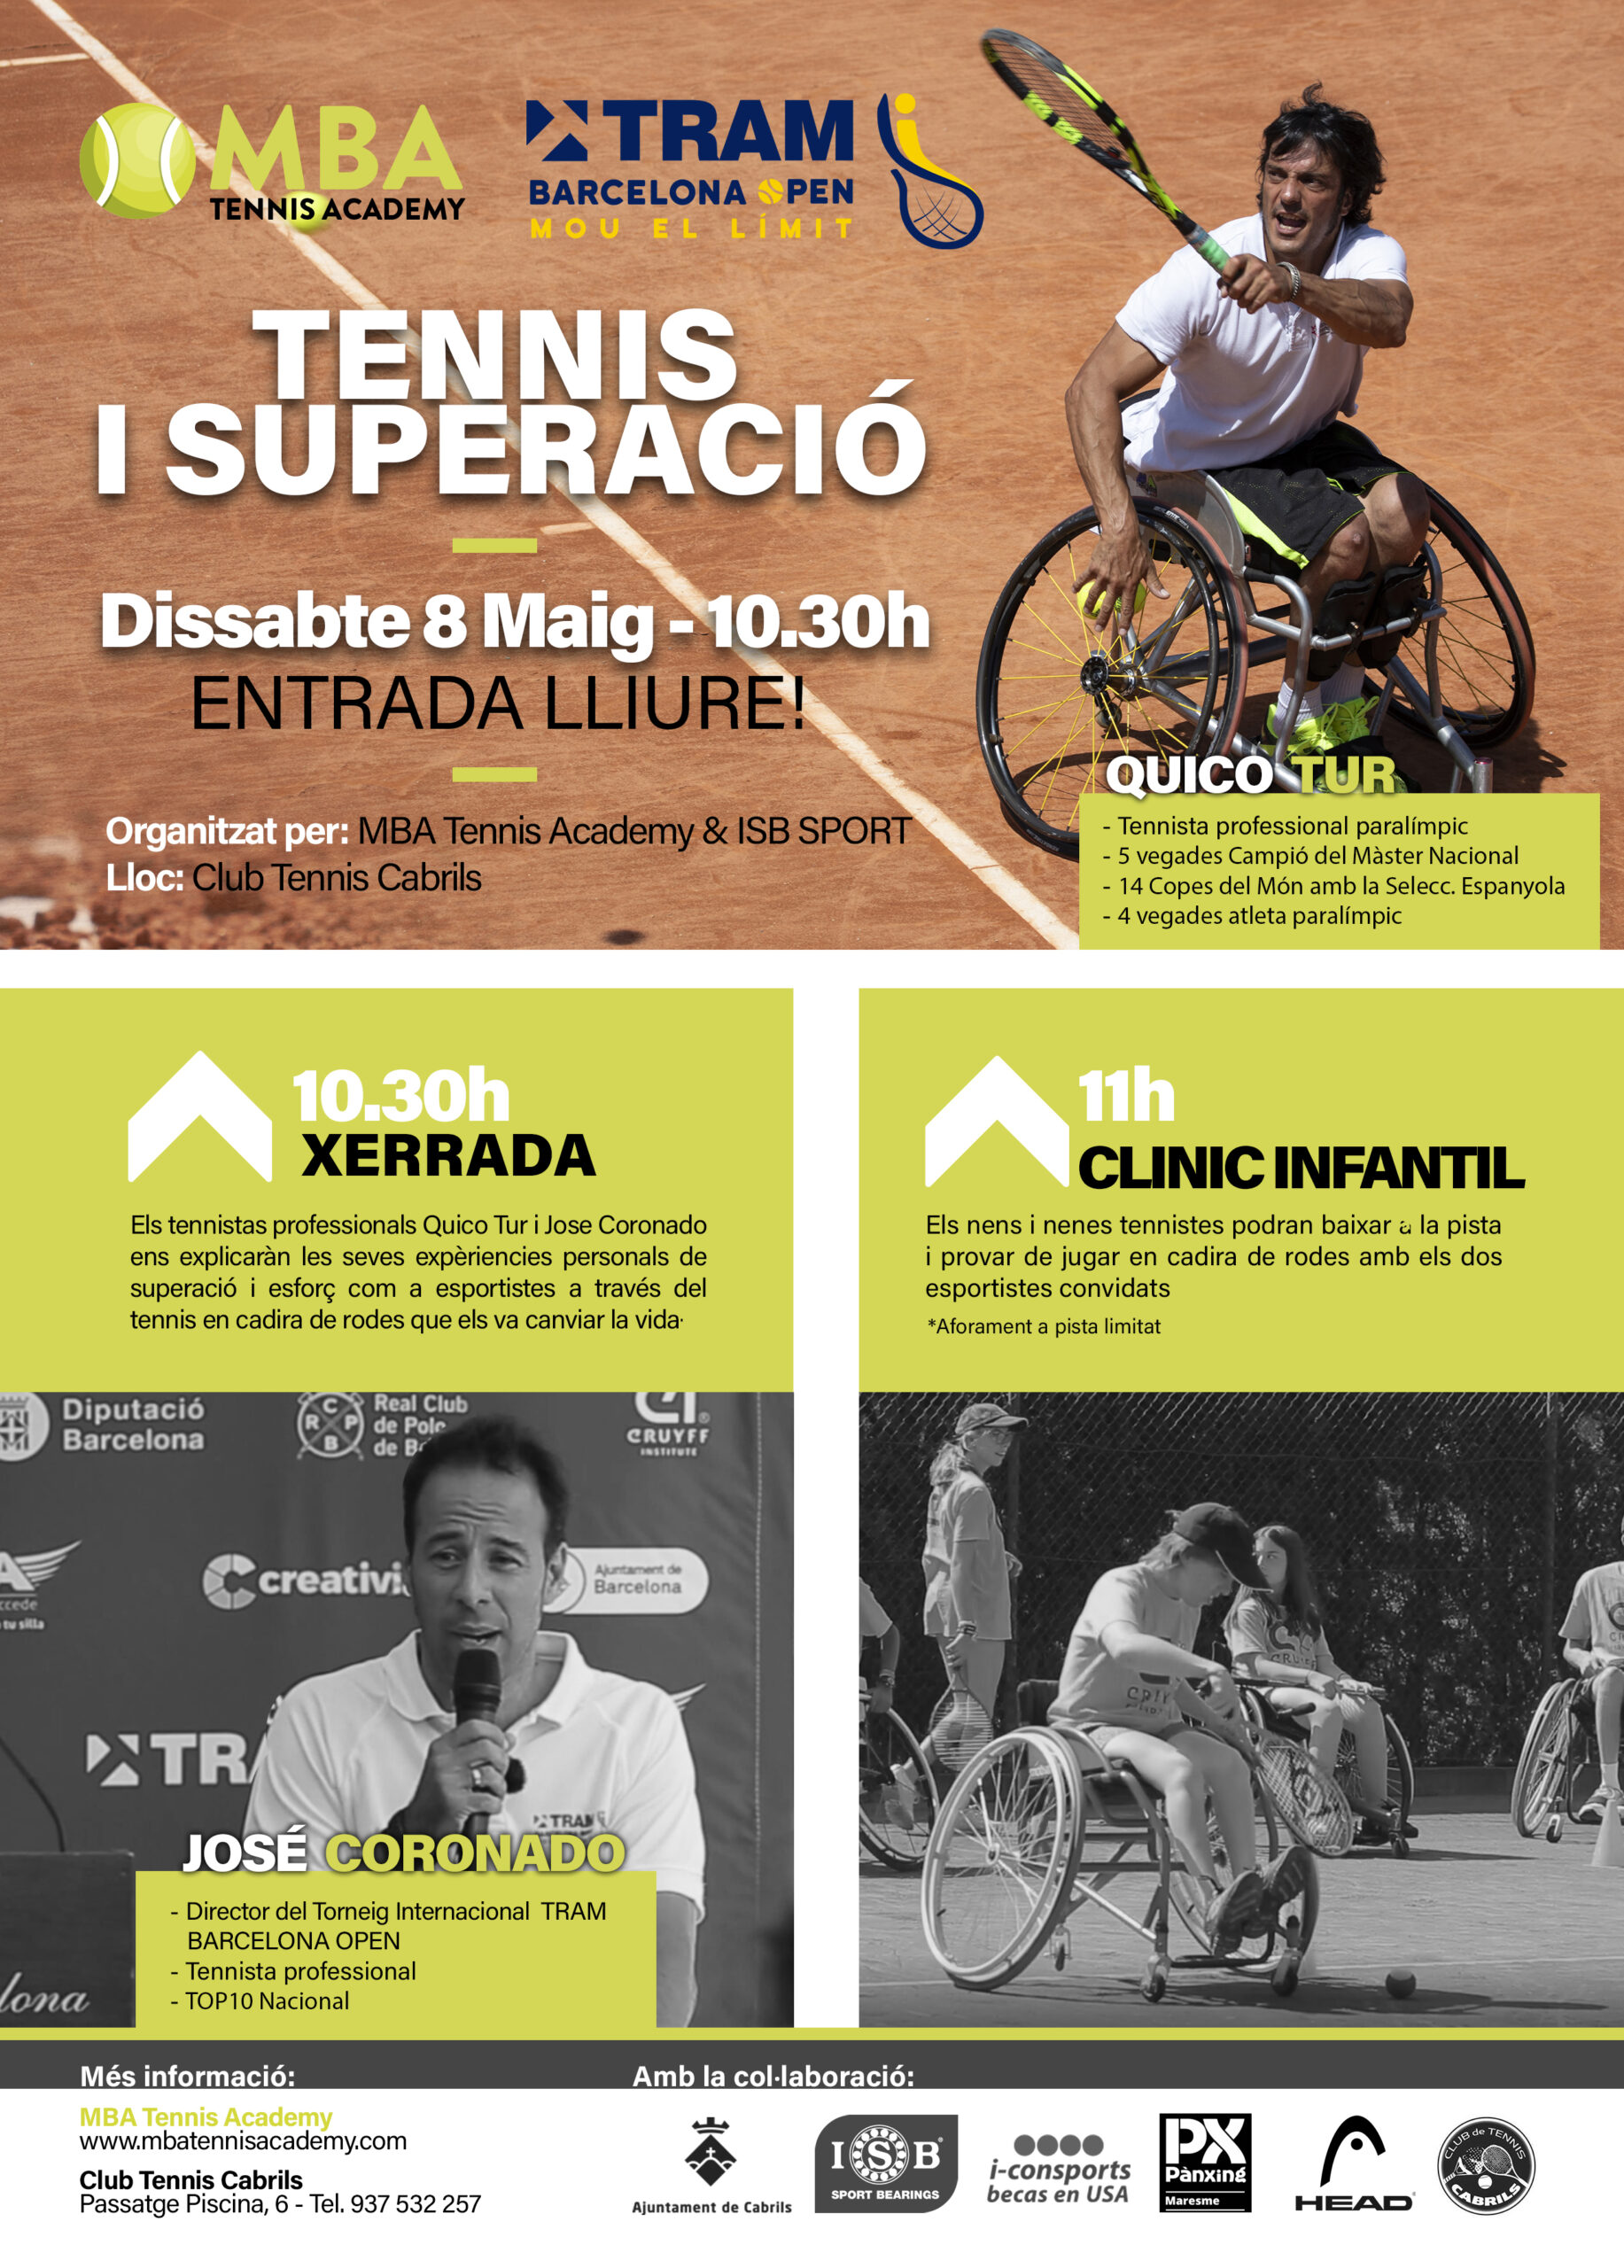 Clinic Infantil en silla de ruedas en MBA Tennis Academy